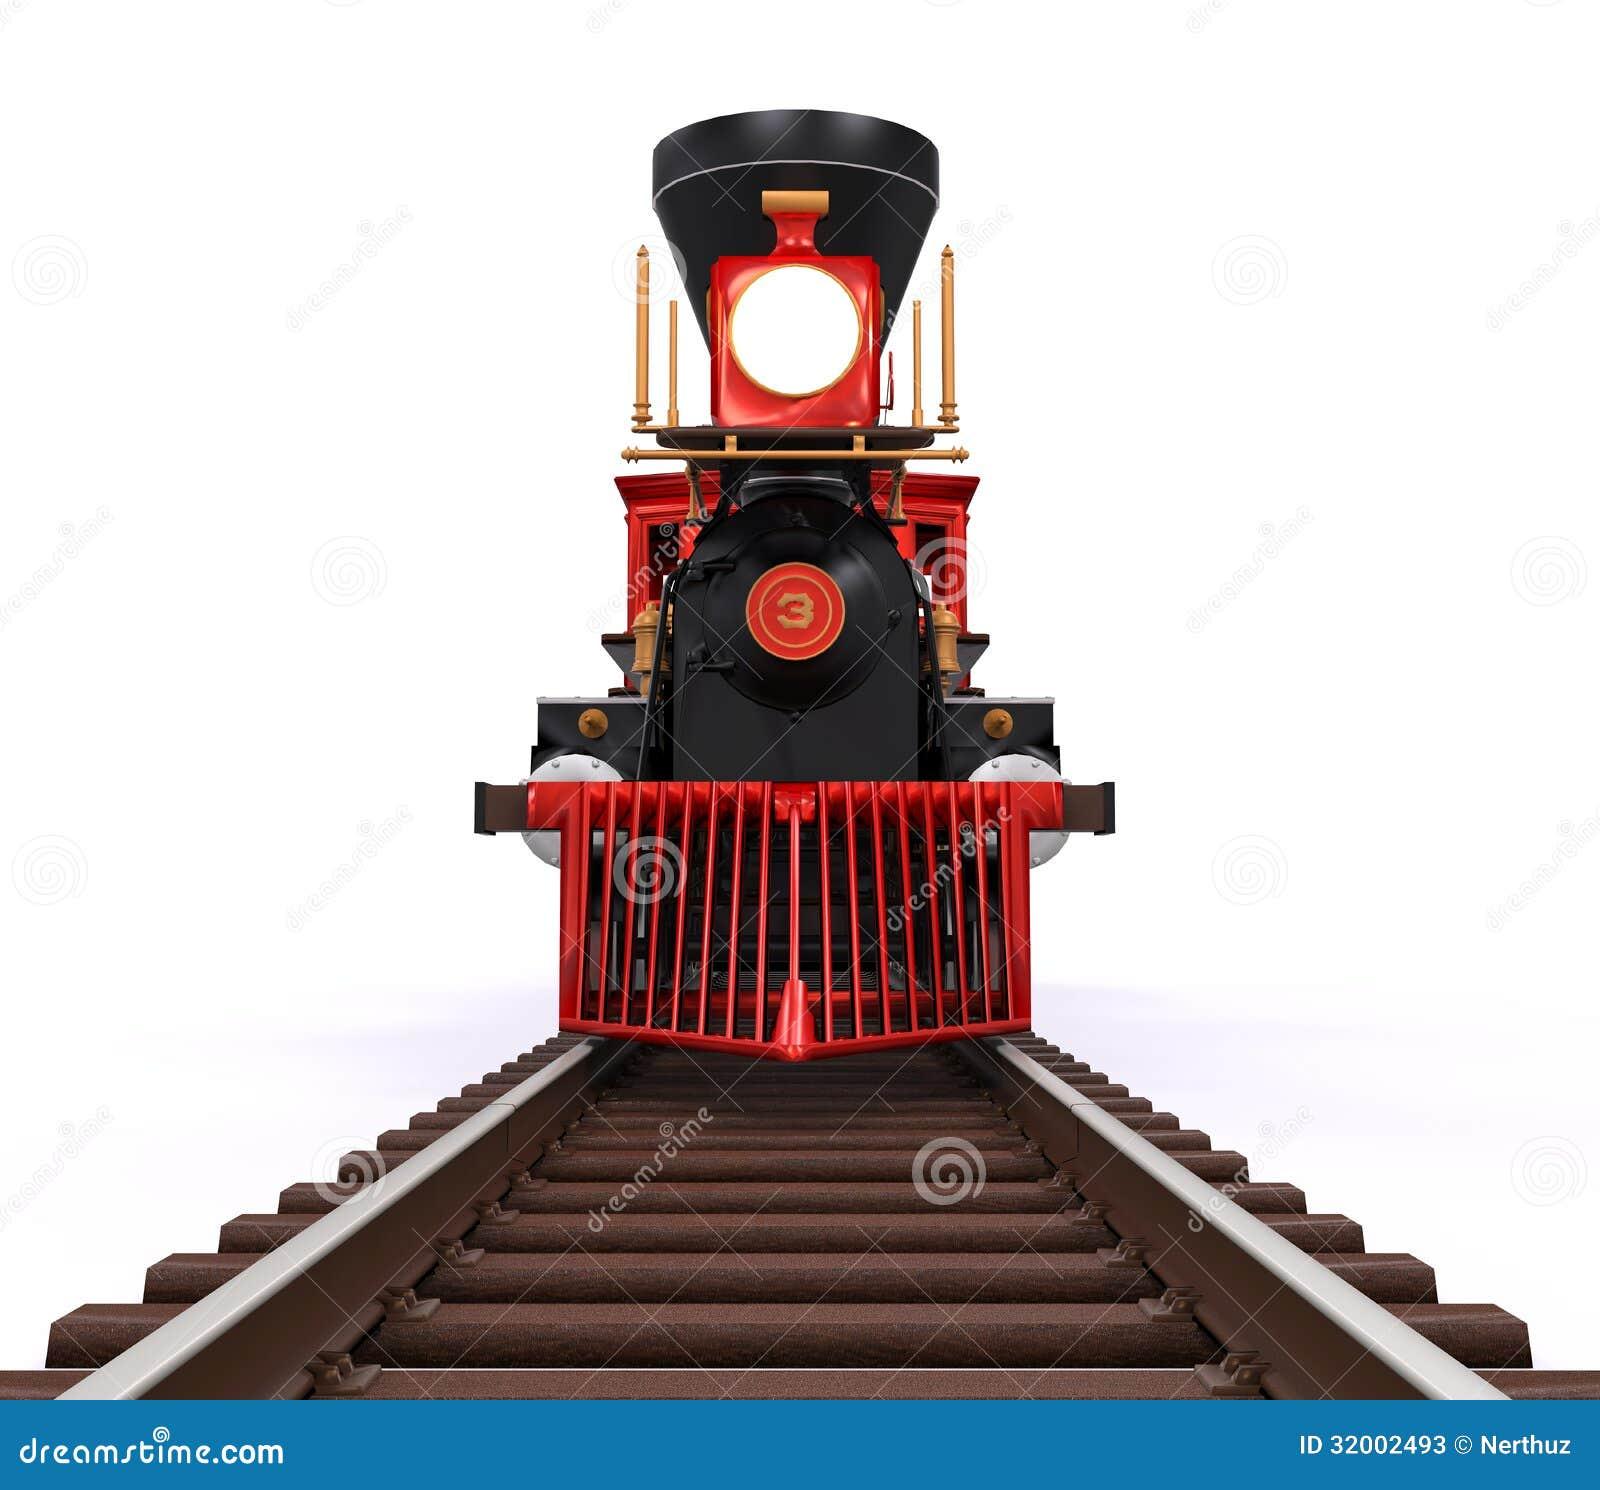 old locomotive train stock photos image 32002493 train track clipart borders train track clipart black and white